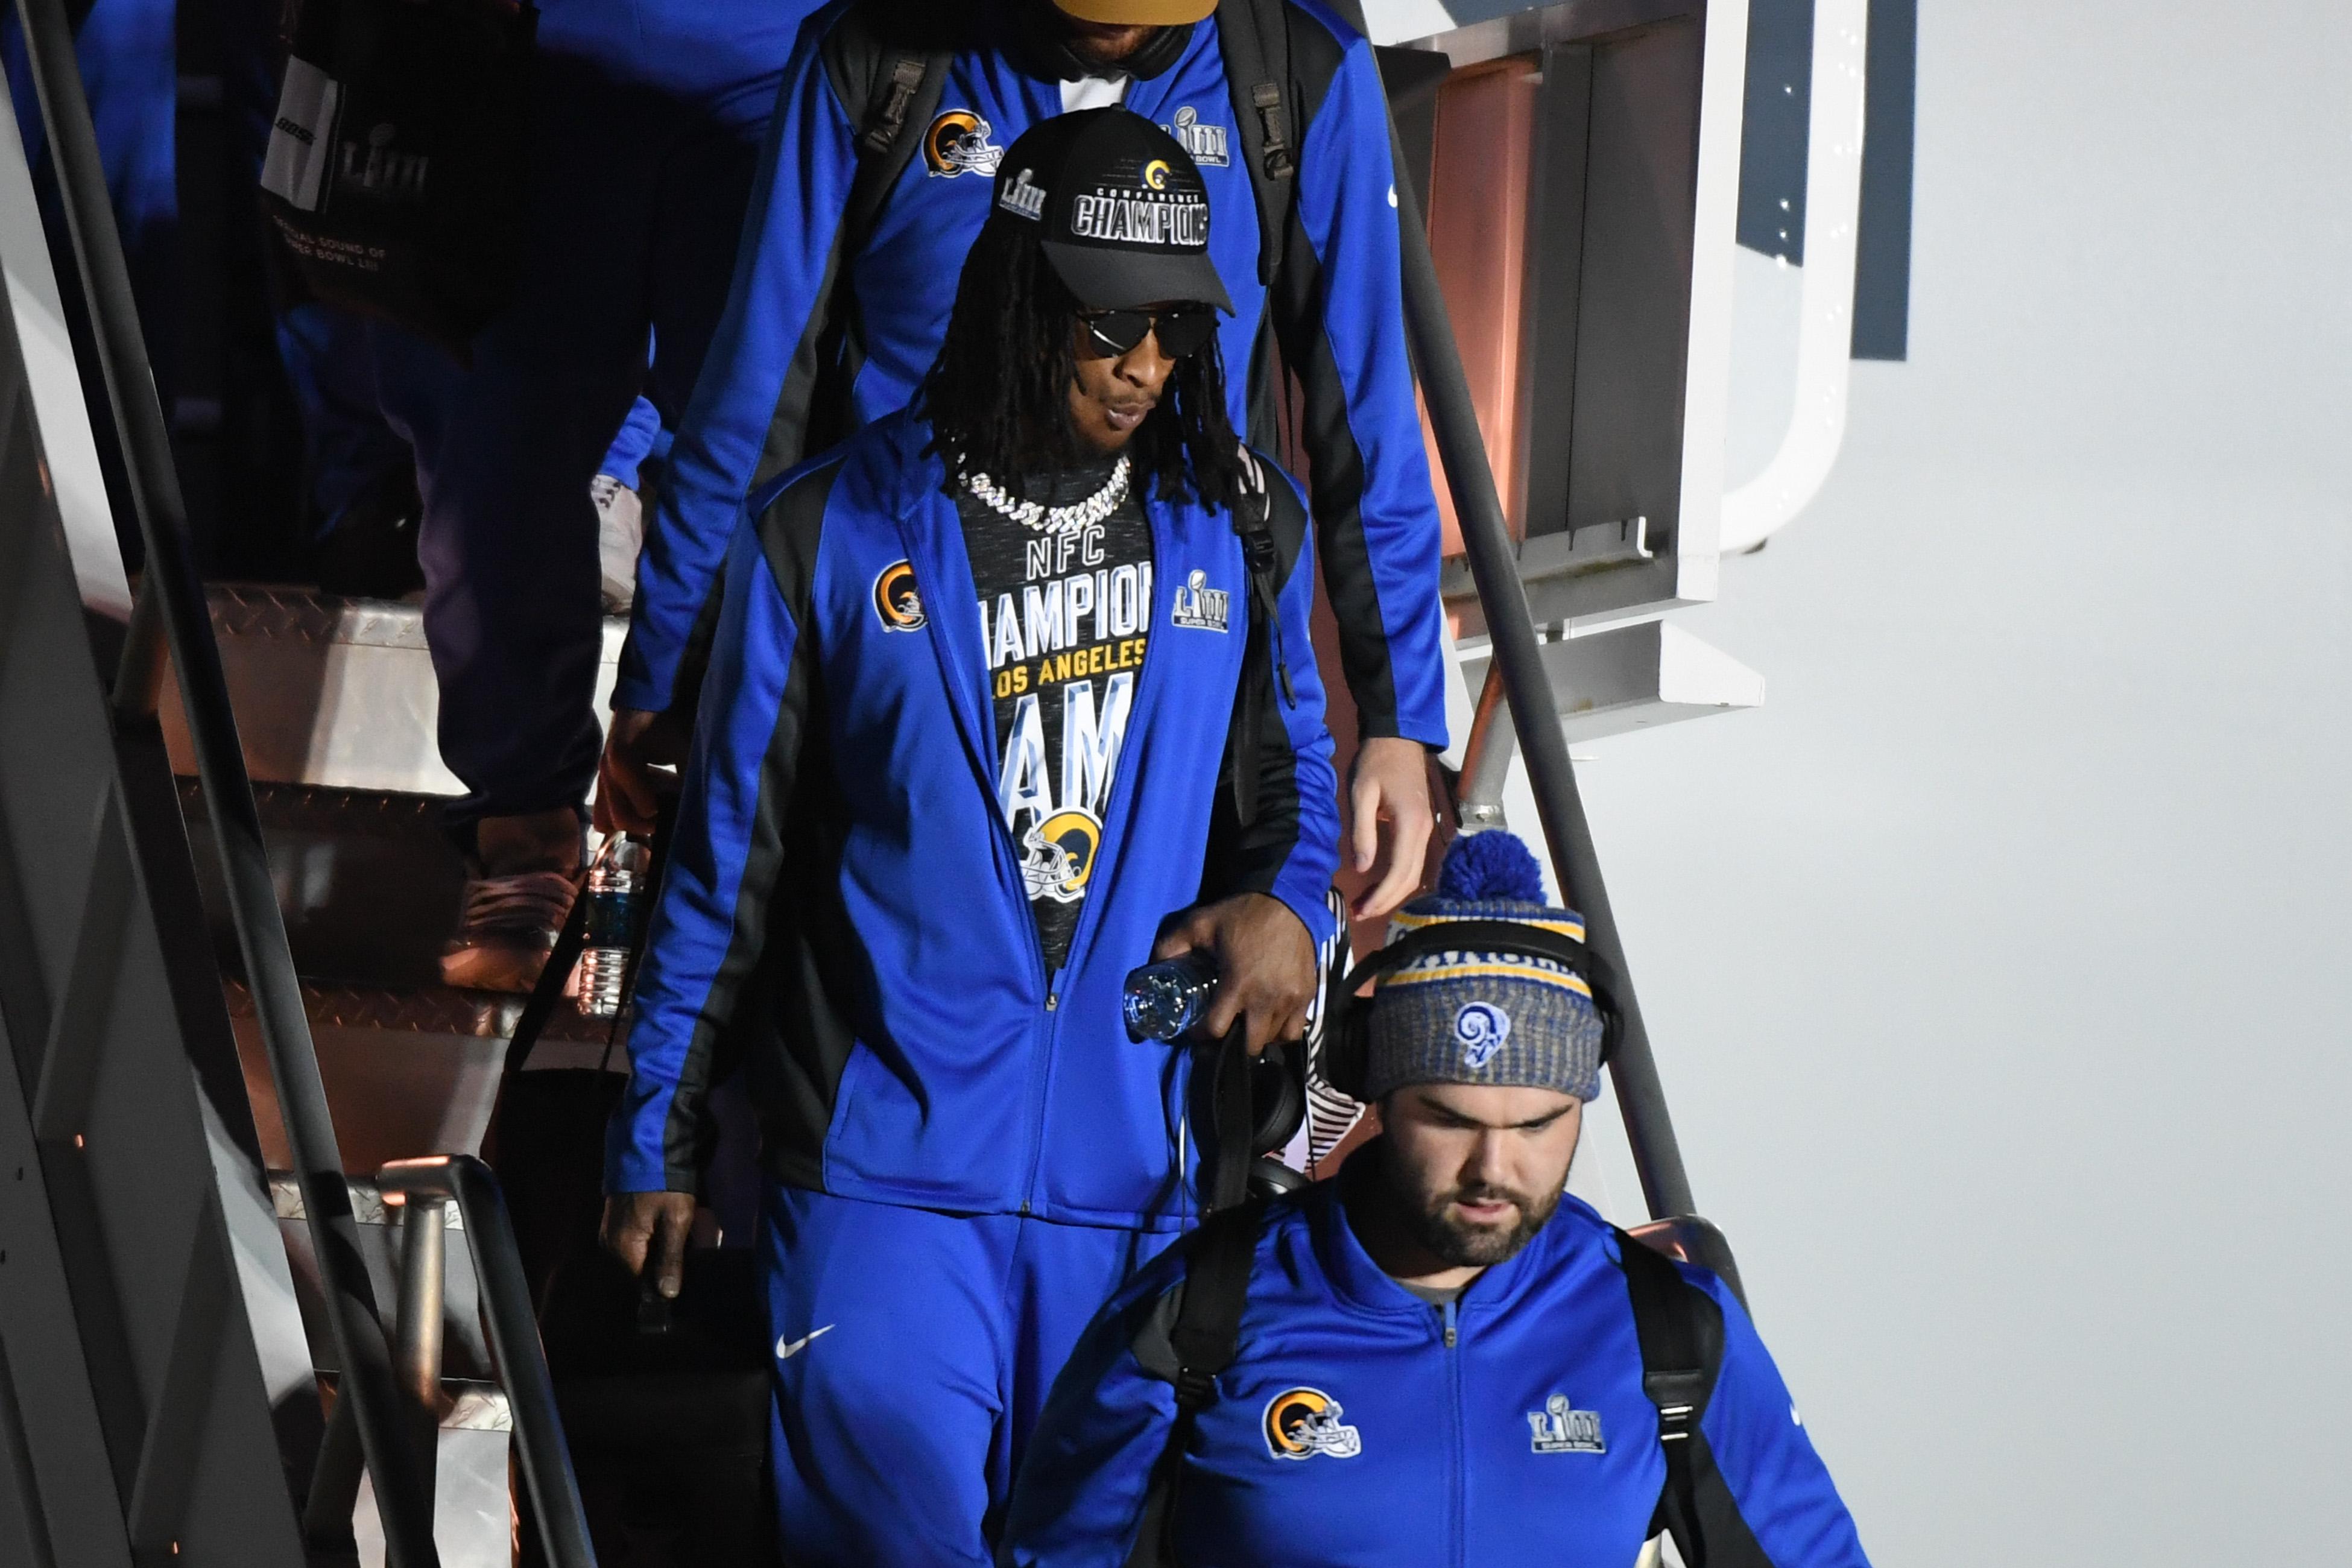 Los Angeles Rams RB Todd Gurley gets off the plane at Hartsfield Jackson Atlanta International Airport ahead of Super Bowl LIII, Jan. 27, 2019.